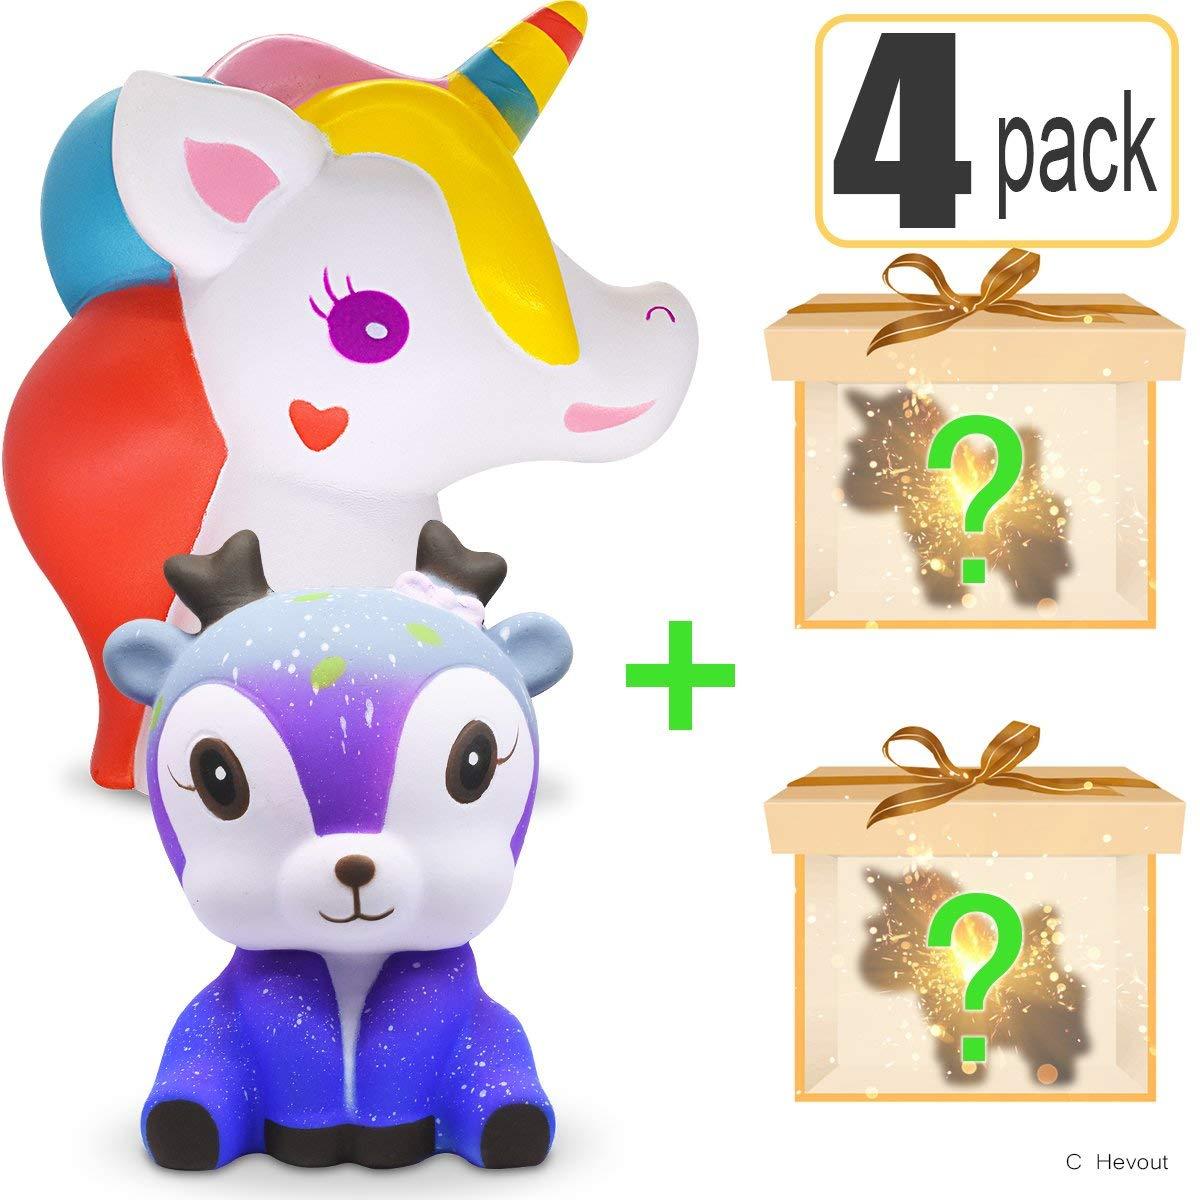 Hevout cheap squshies jumbo slow rising squishy toys prime unicornio galaxy deer cute squishies 4 pcs for girls toys